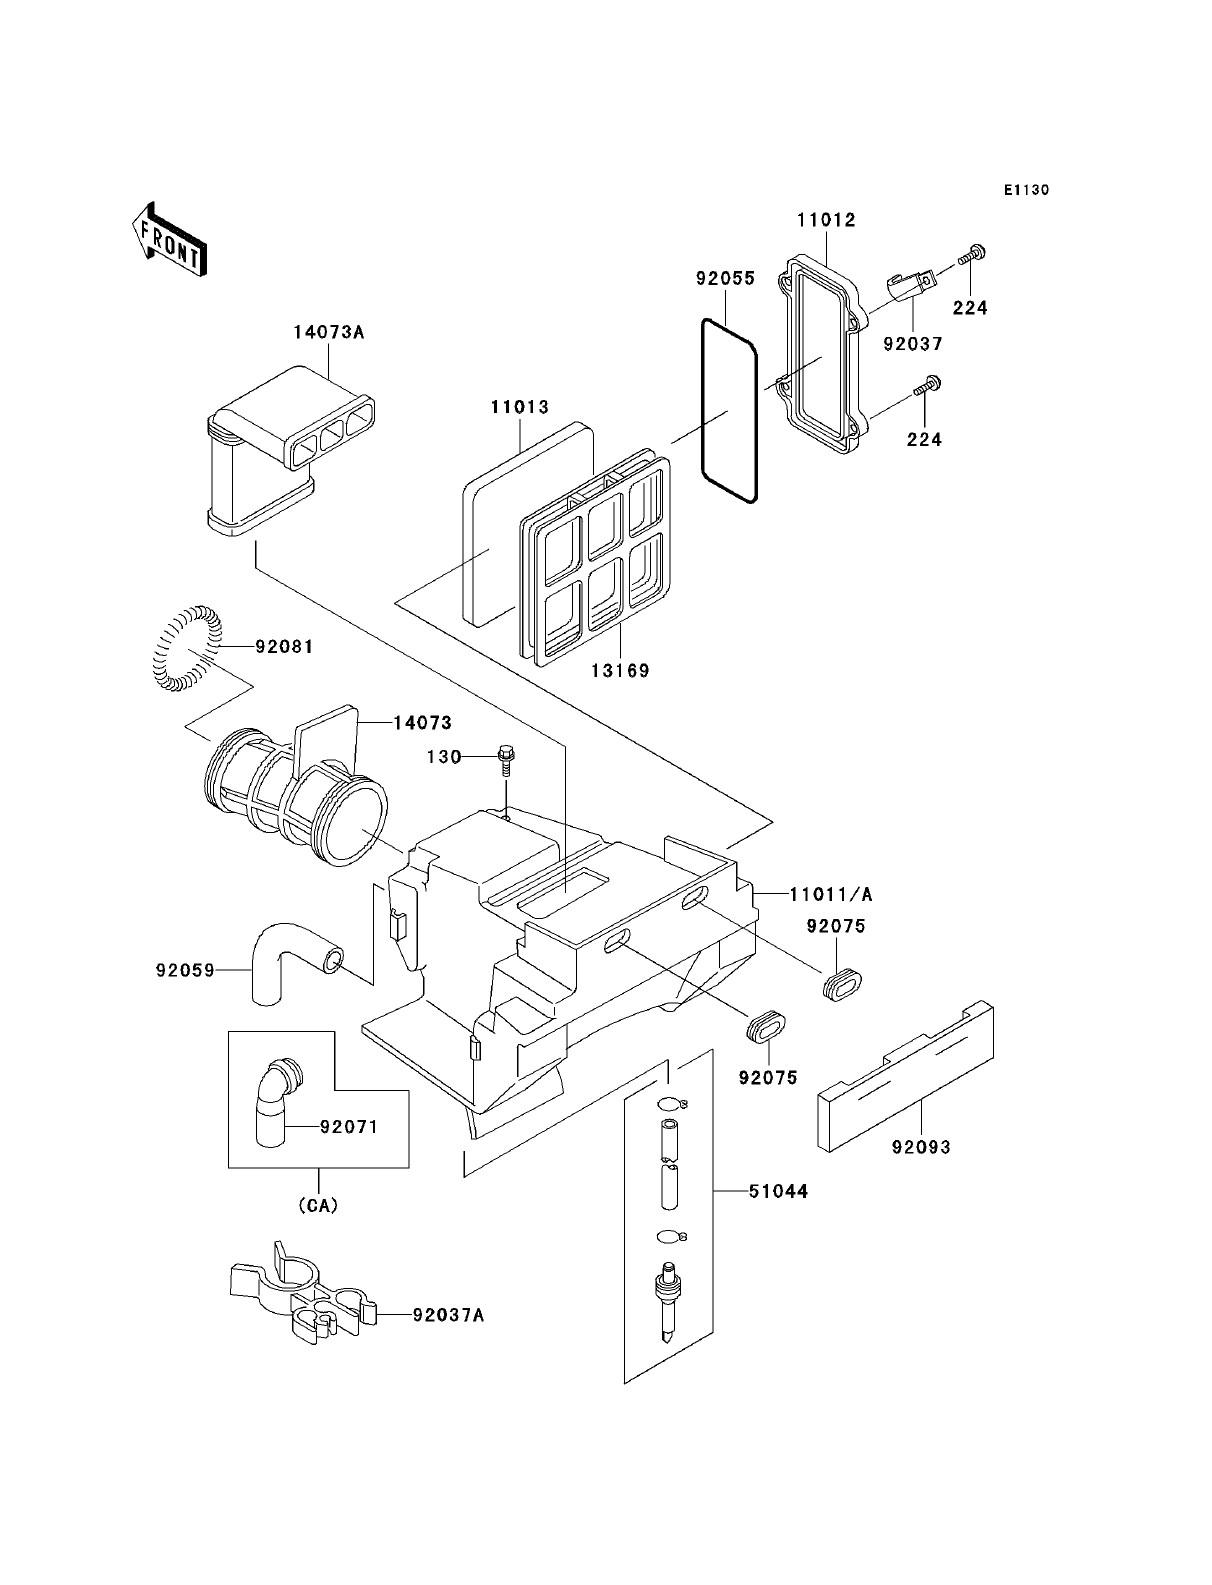 Air Brake Parts Diagram My Wiring Diagram